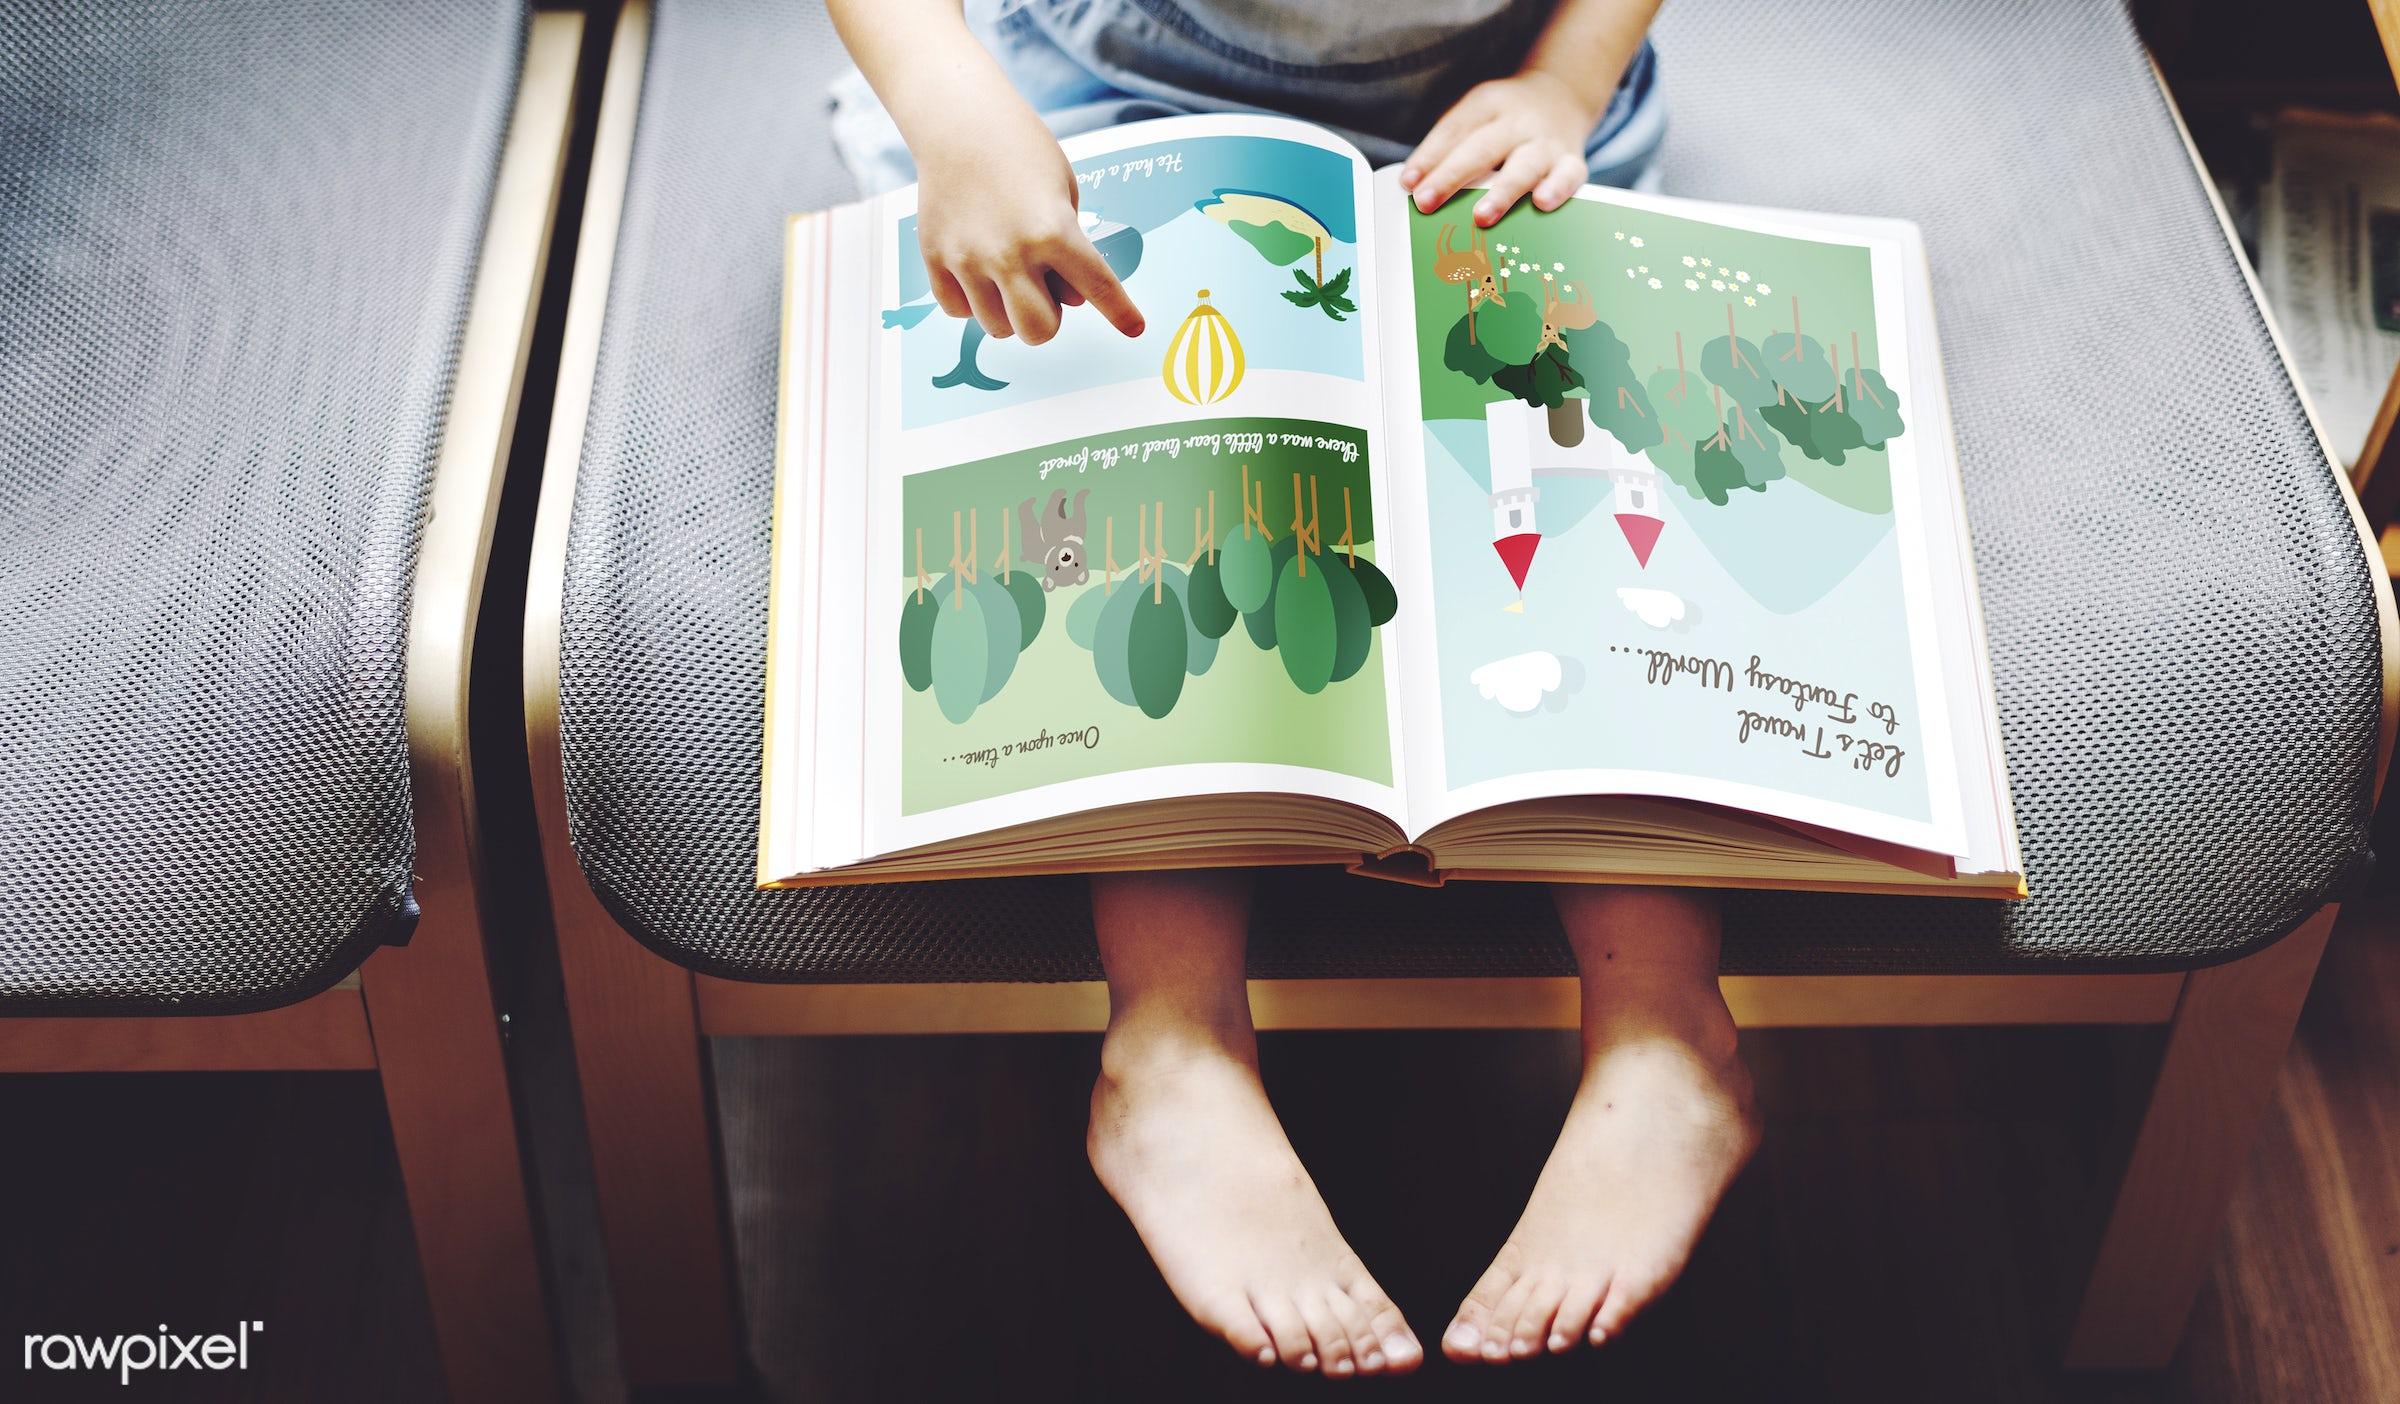 activity, adolescence, art, book, casual, cheerful, child, childhood, children, cute, education, enjoy, enjoyment, equipment...